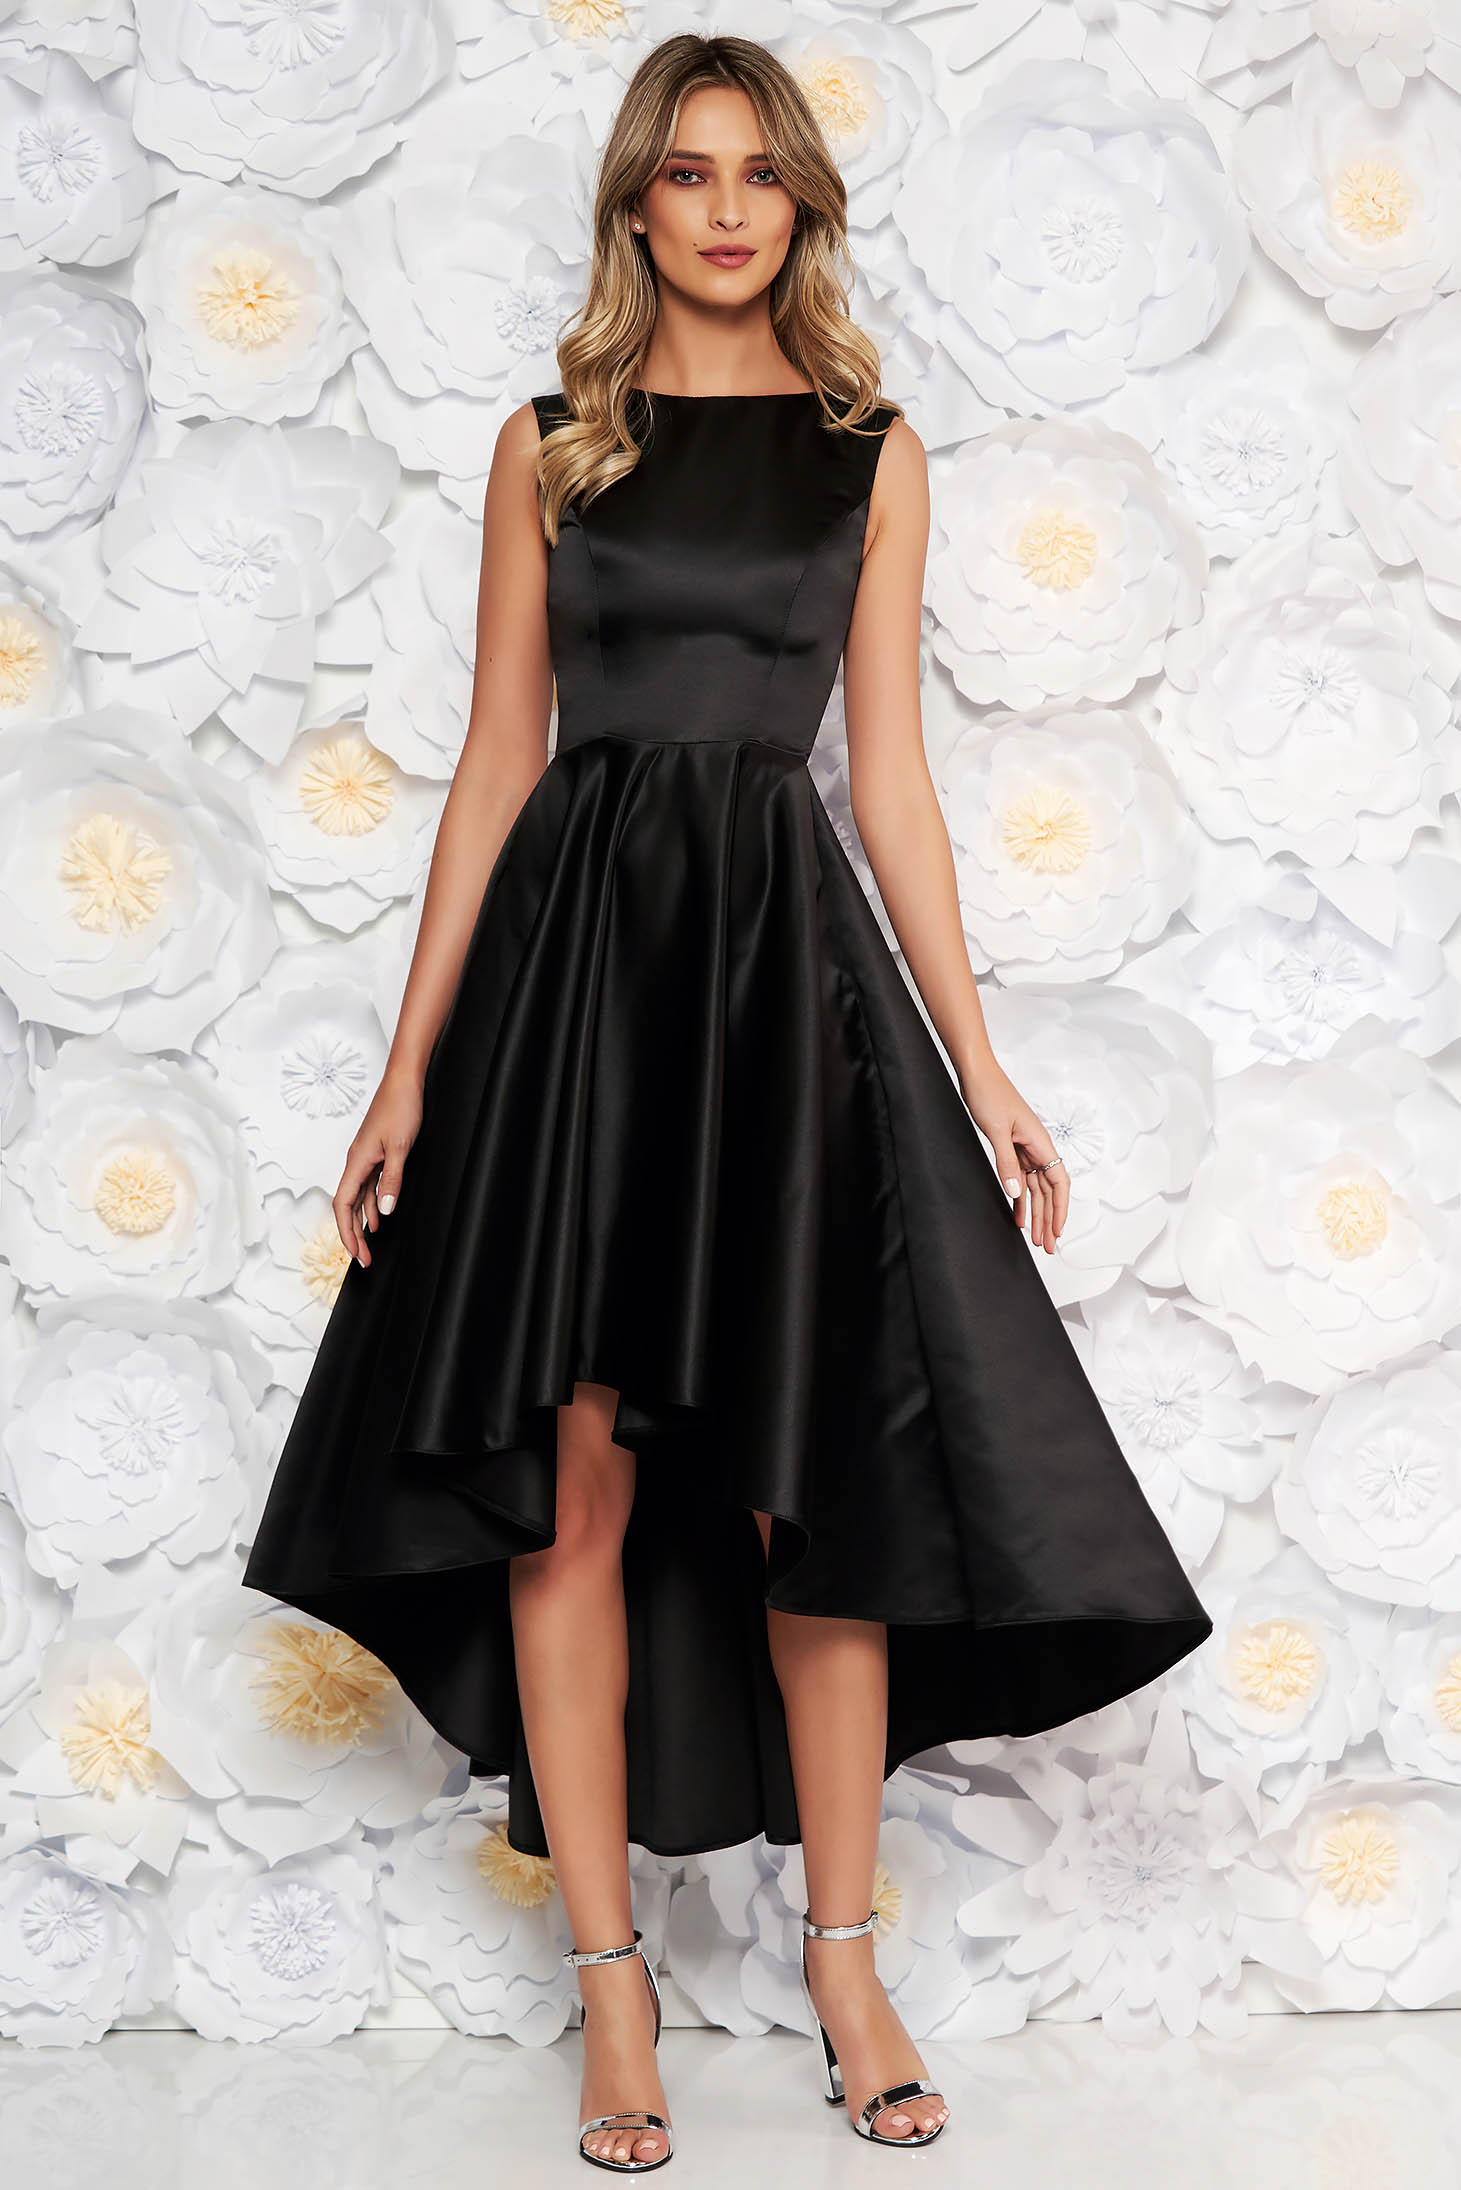 Rochie neagra eleganta asimetrica de ocazie in clos din material satinat fara maneci